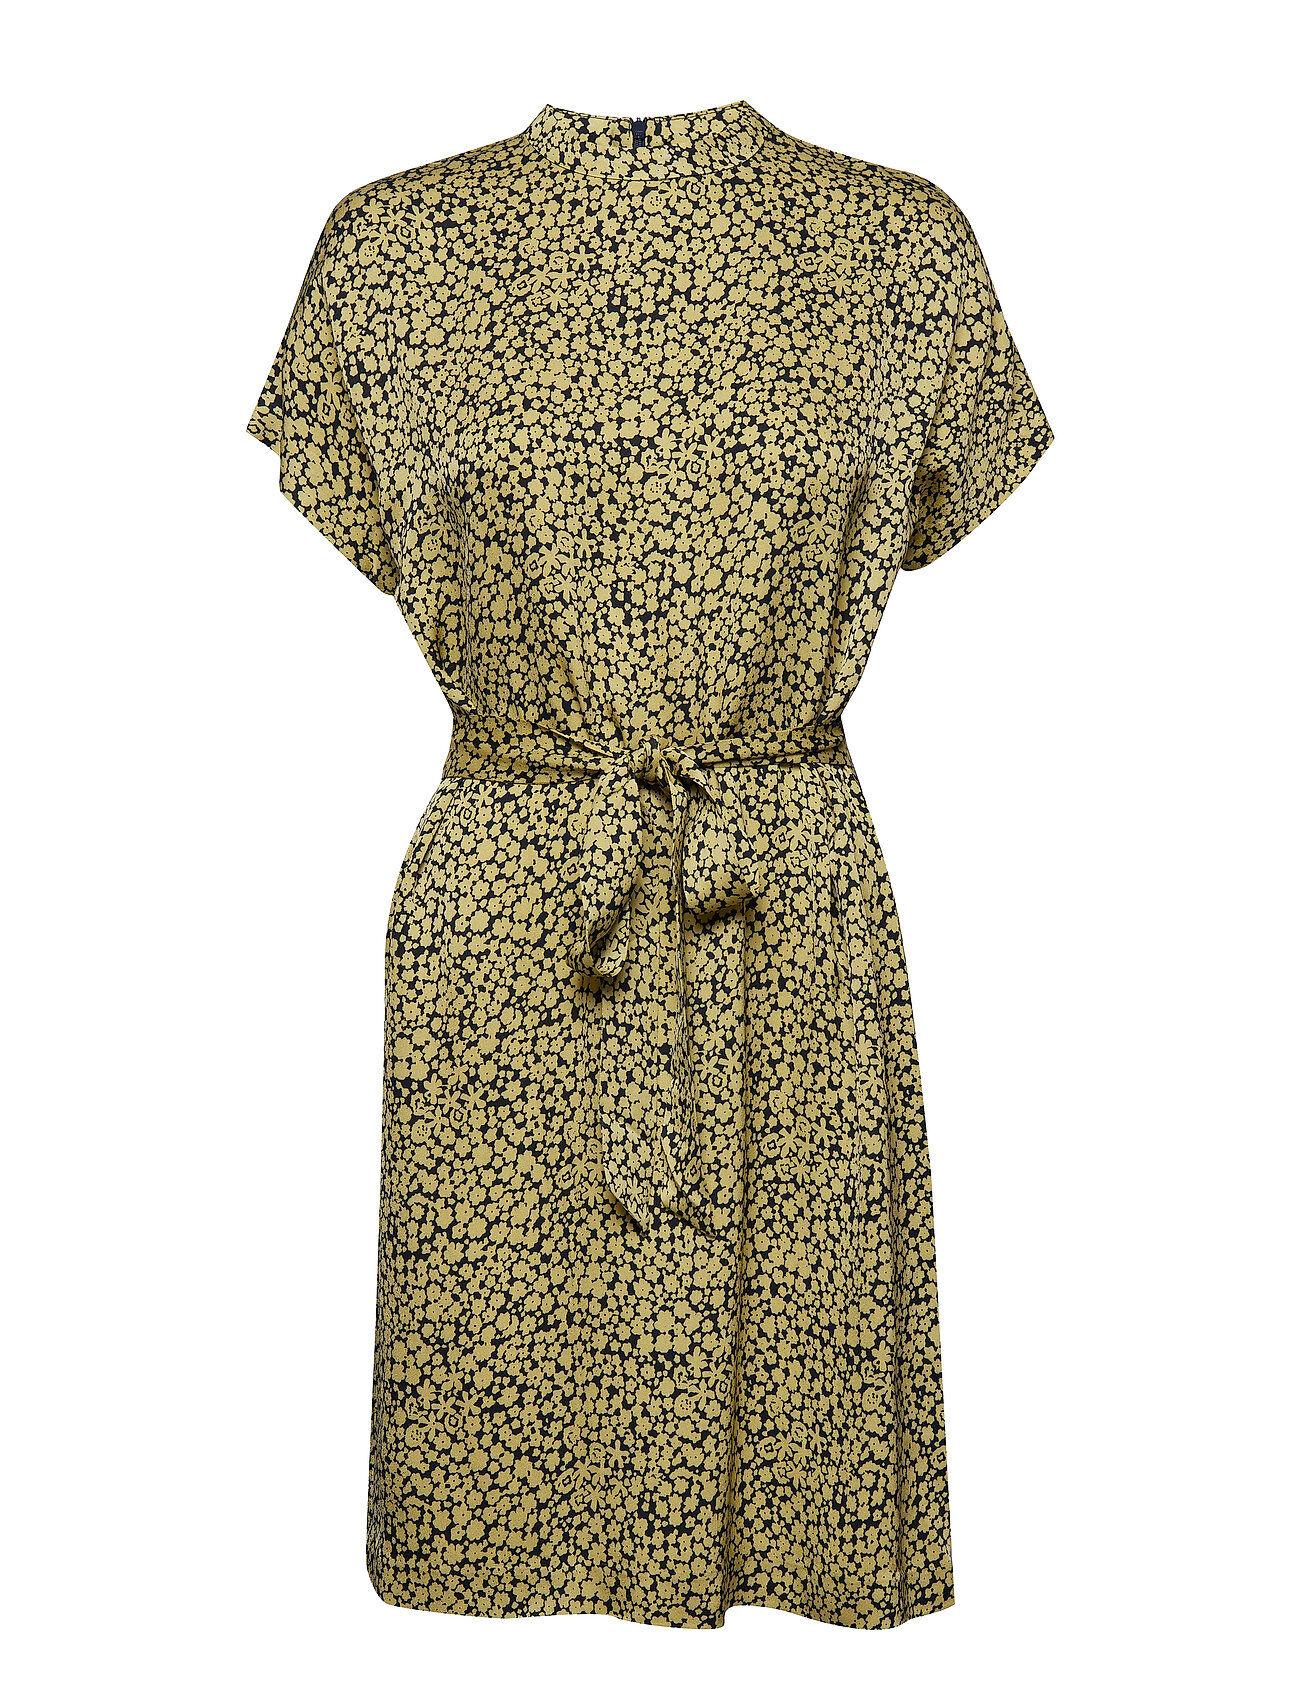 Samsøe & Samsøe Kimberly Ss Dress Aop 8325